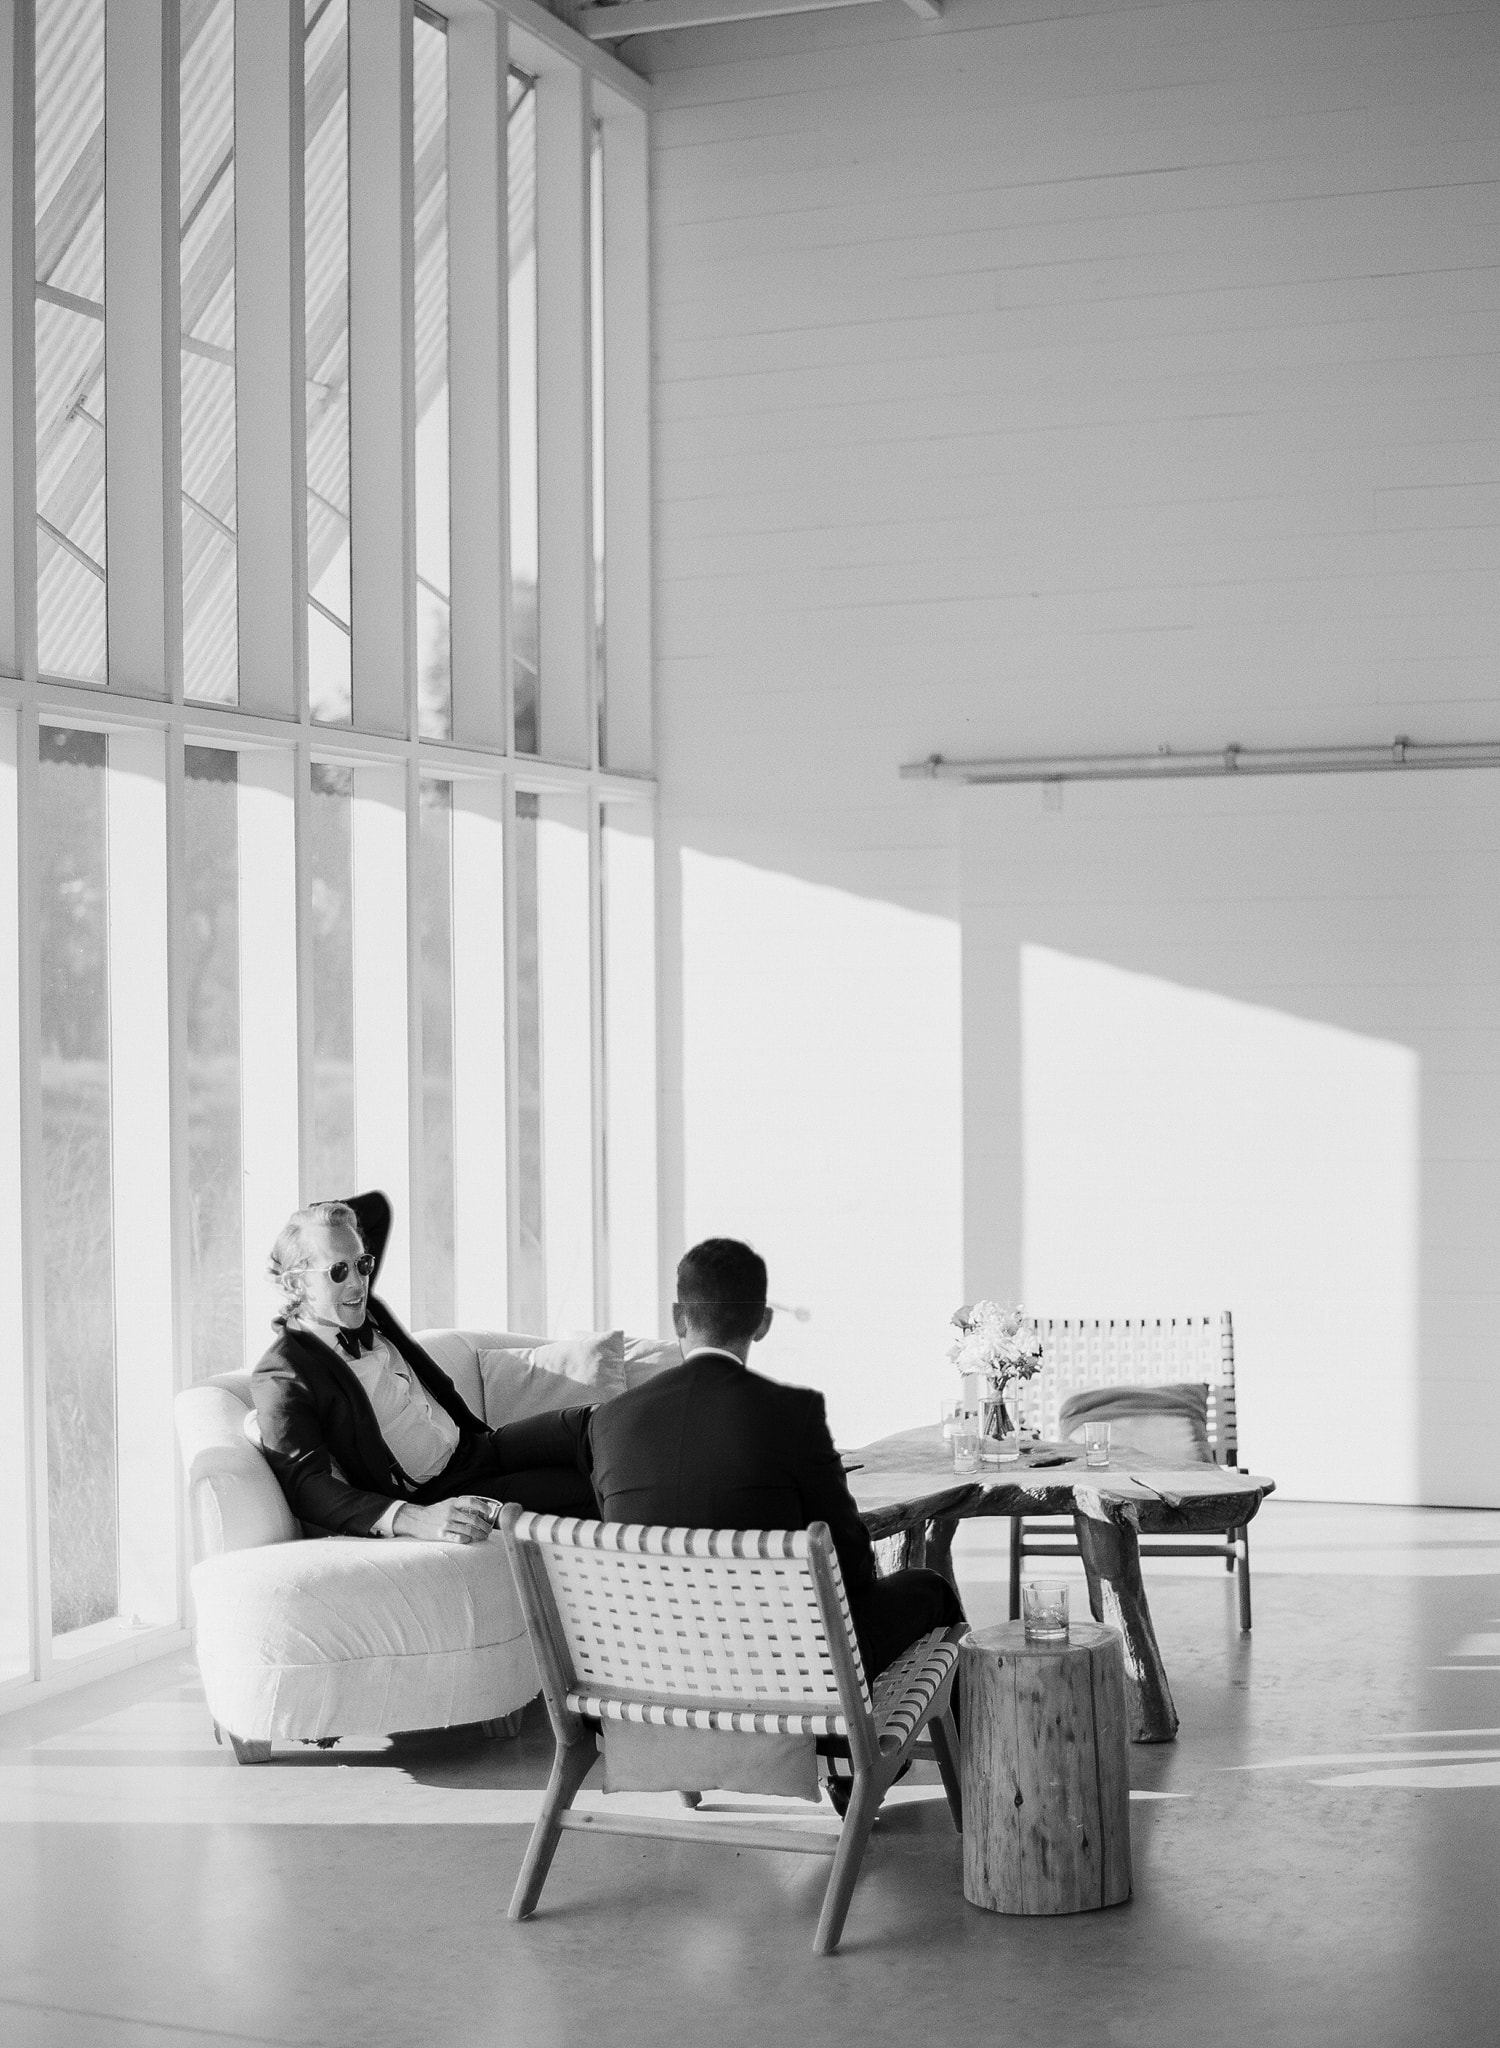 PROSPECT_HOUSE_WEDDING_AUSTIN_TX_MATTHEW_MOORE-00677-2.jpg